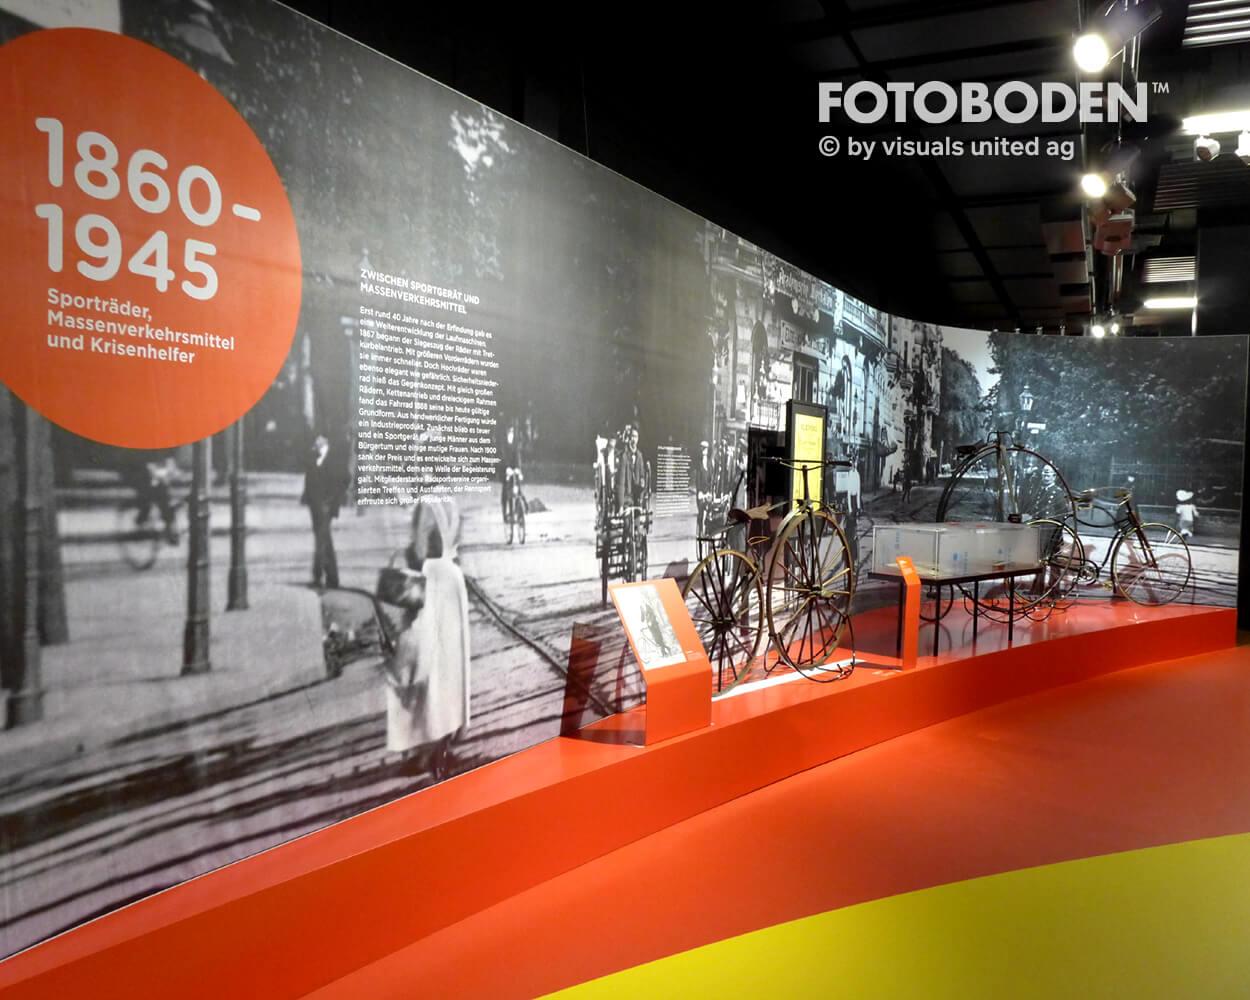 Fahrrad2 Ausstellung Museum  Raumkonzept Stimmung Museumsboden Ausstellungsboden Fotoboden Vinylboden Flooring Individuell Event